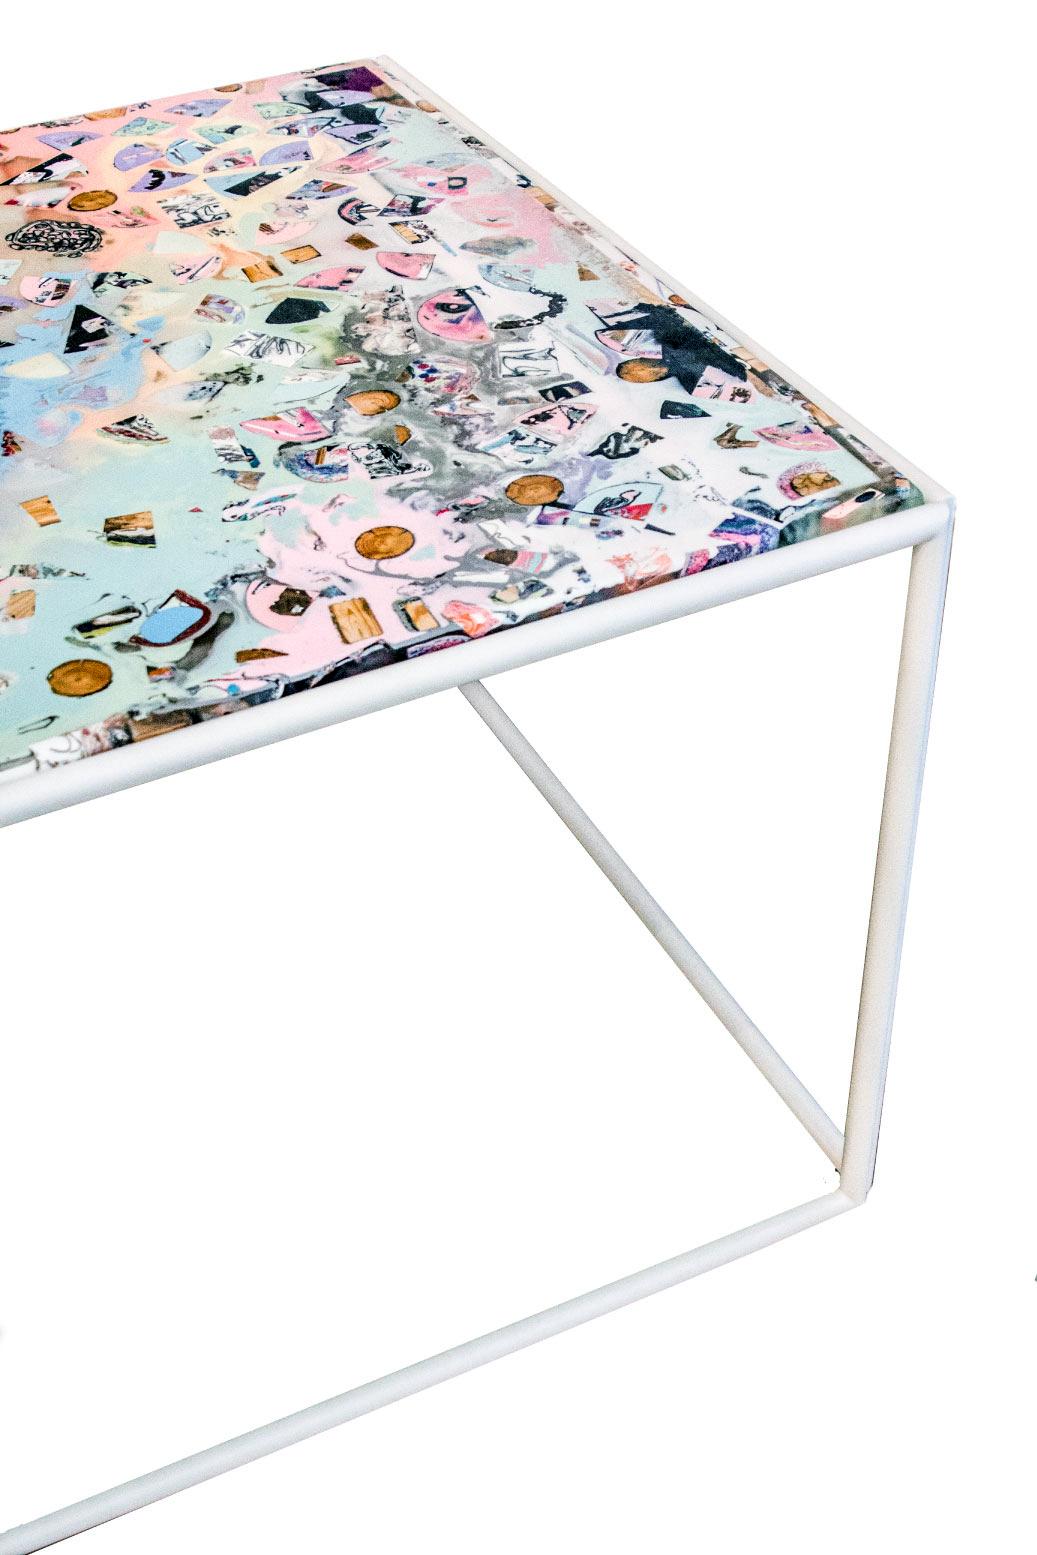 VERSA-TABLE_CCKAI_CLOSEUP_2.jpg